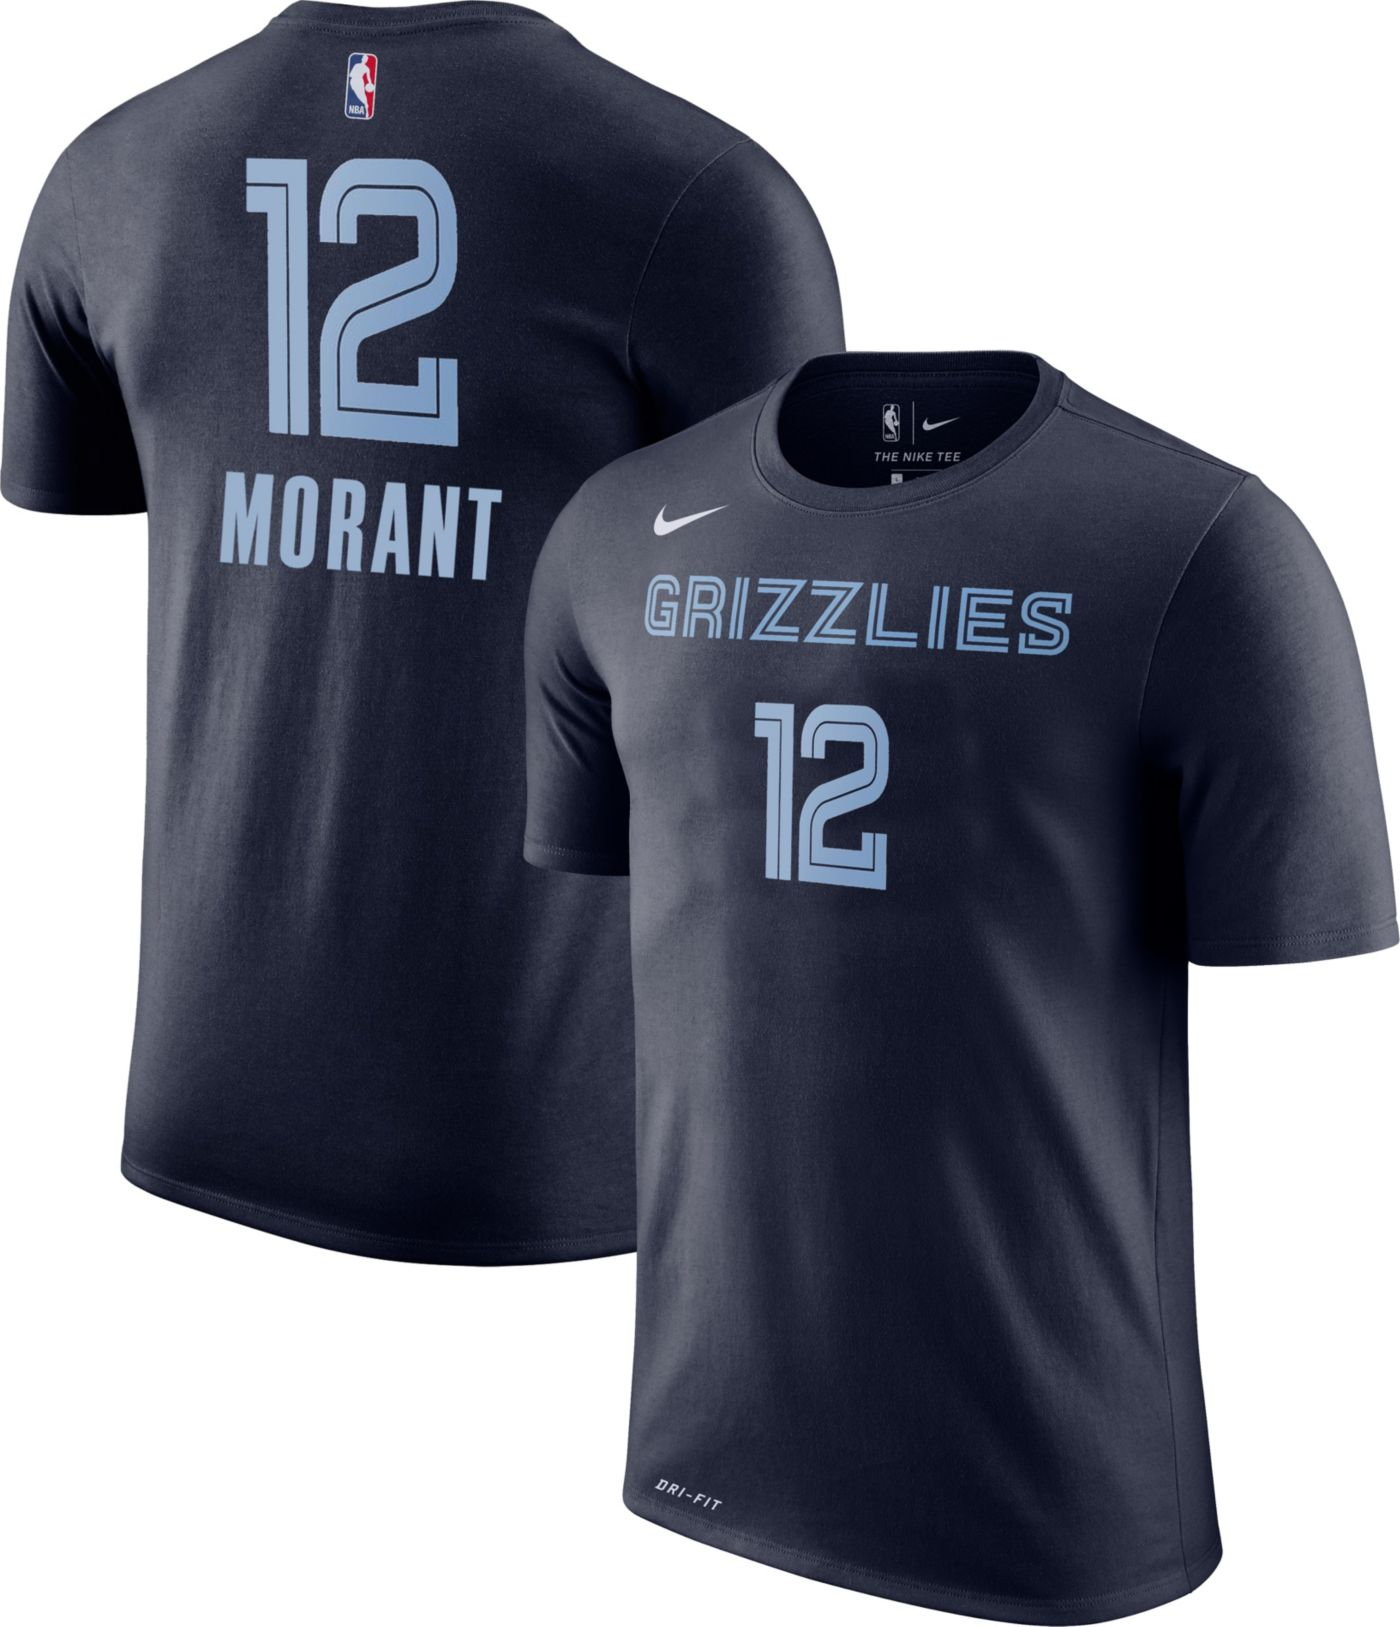 Nike Men's Memphis Grizzlies Ja Morant #12 Dri-FIT Navy T-Shirt